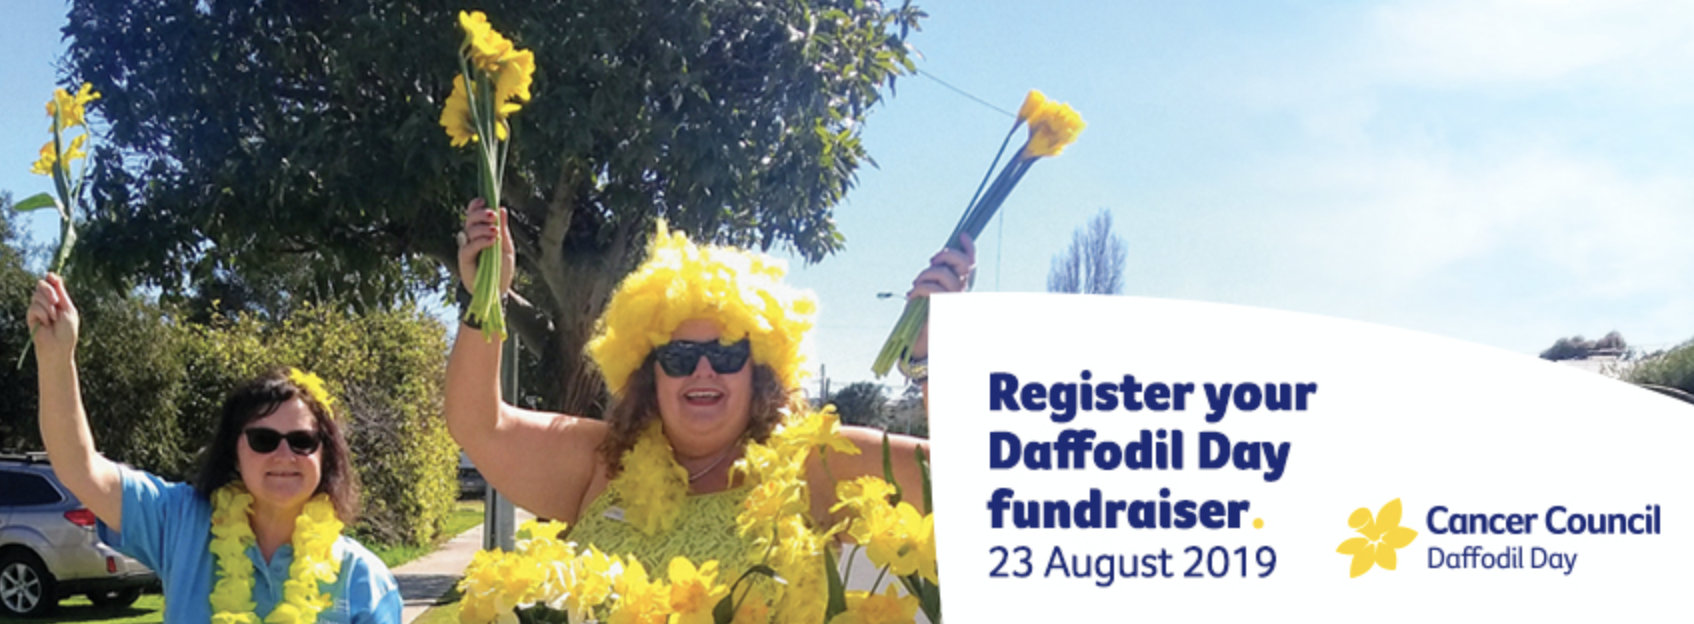 Register your fundraiser Facebook Cover - Large